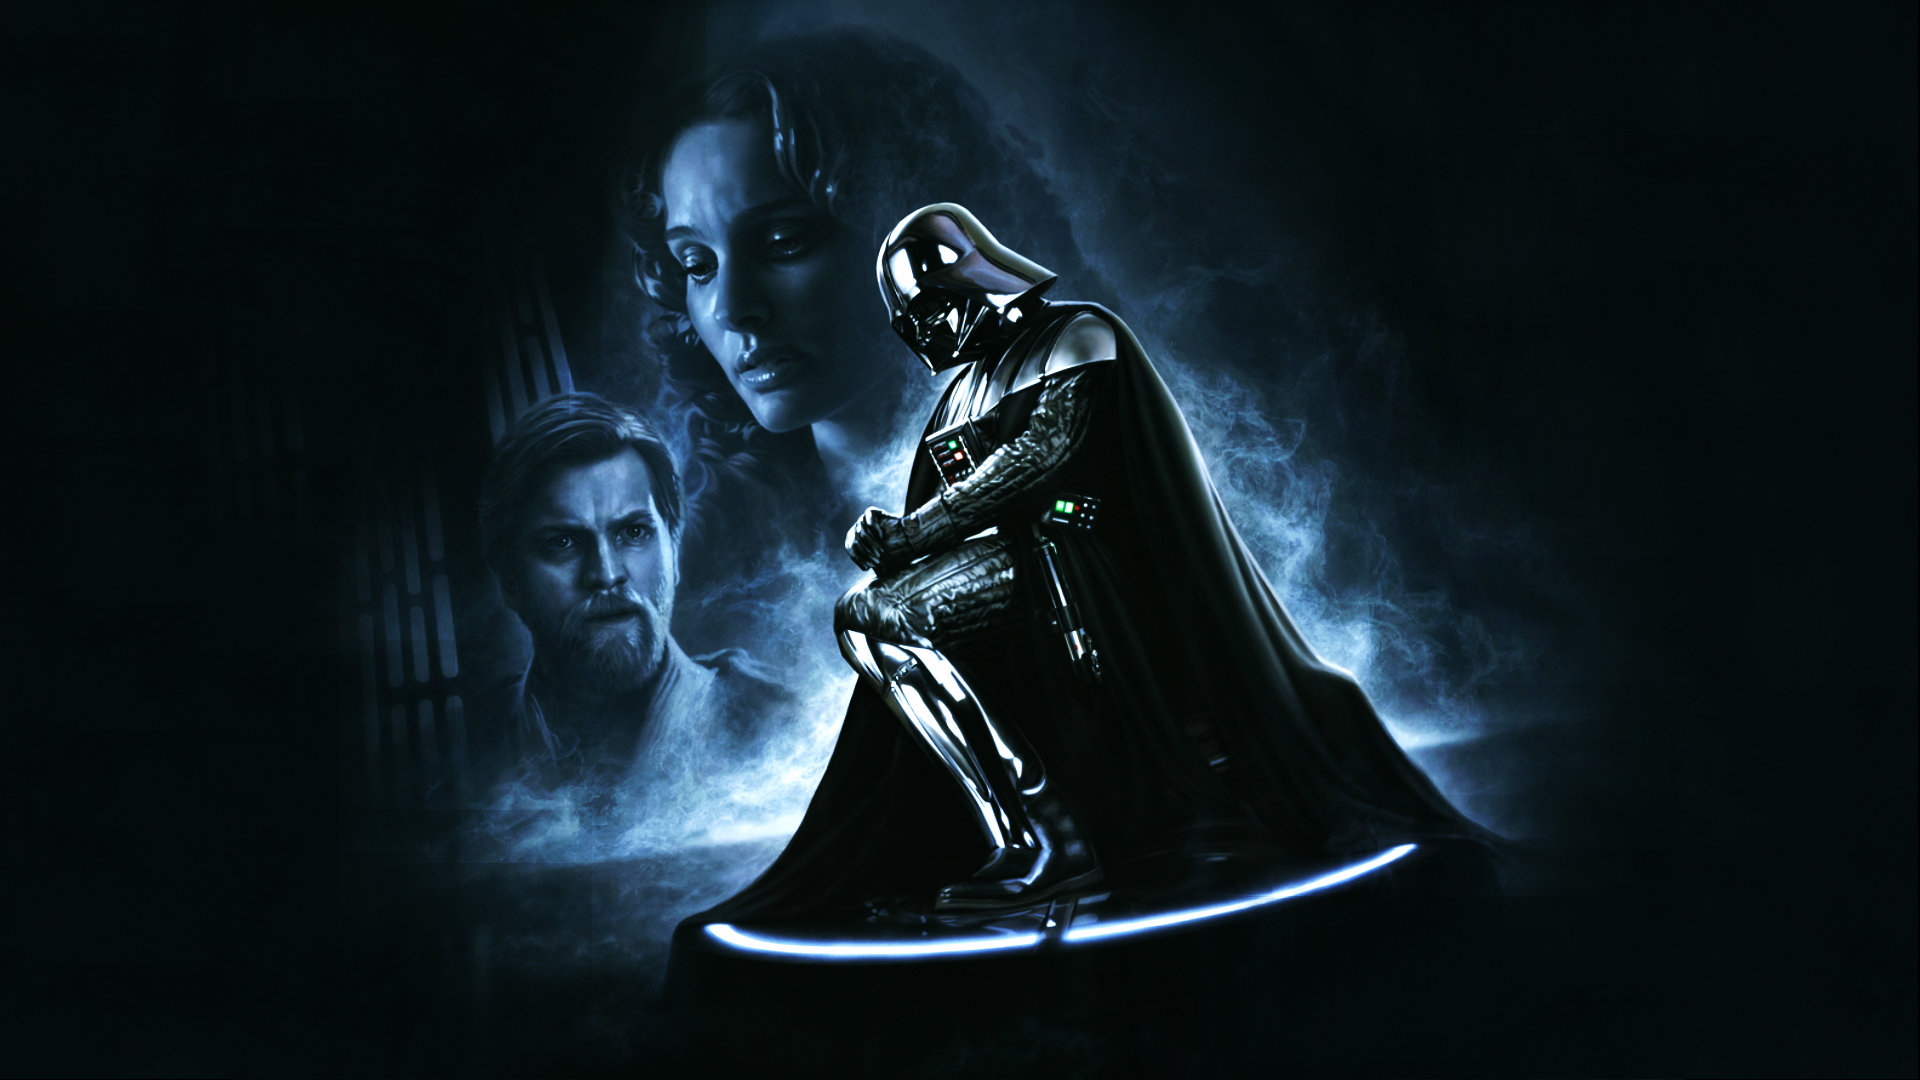 Darth Vader Wallpapers 1920x1080 Full Hd 1080p Desktop